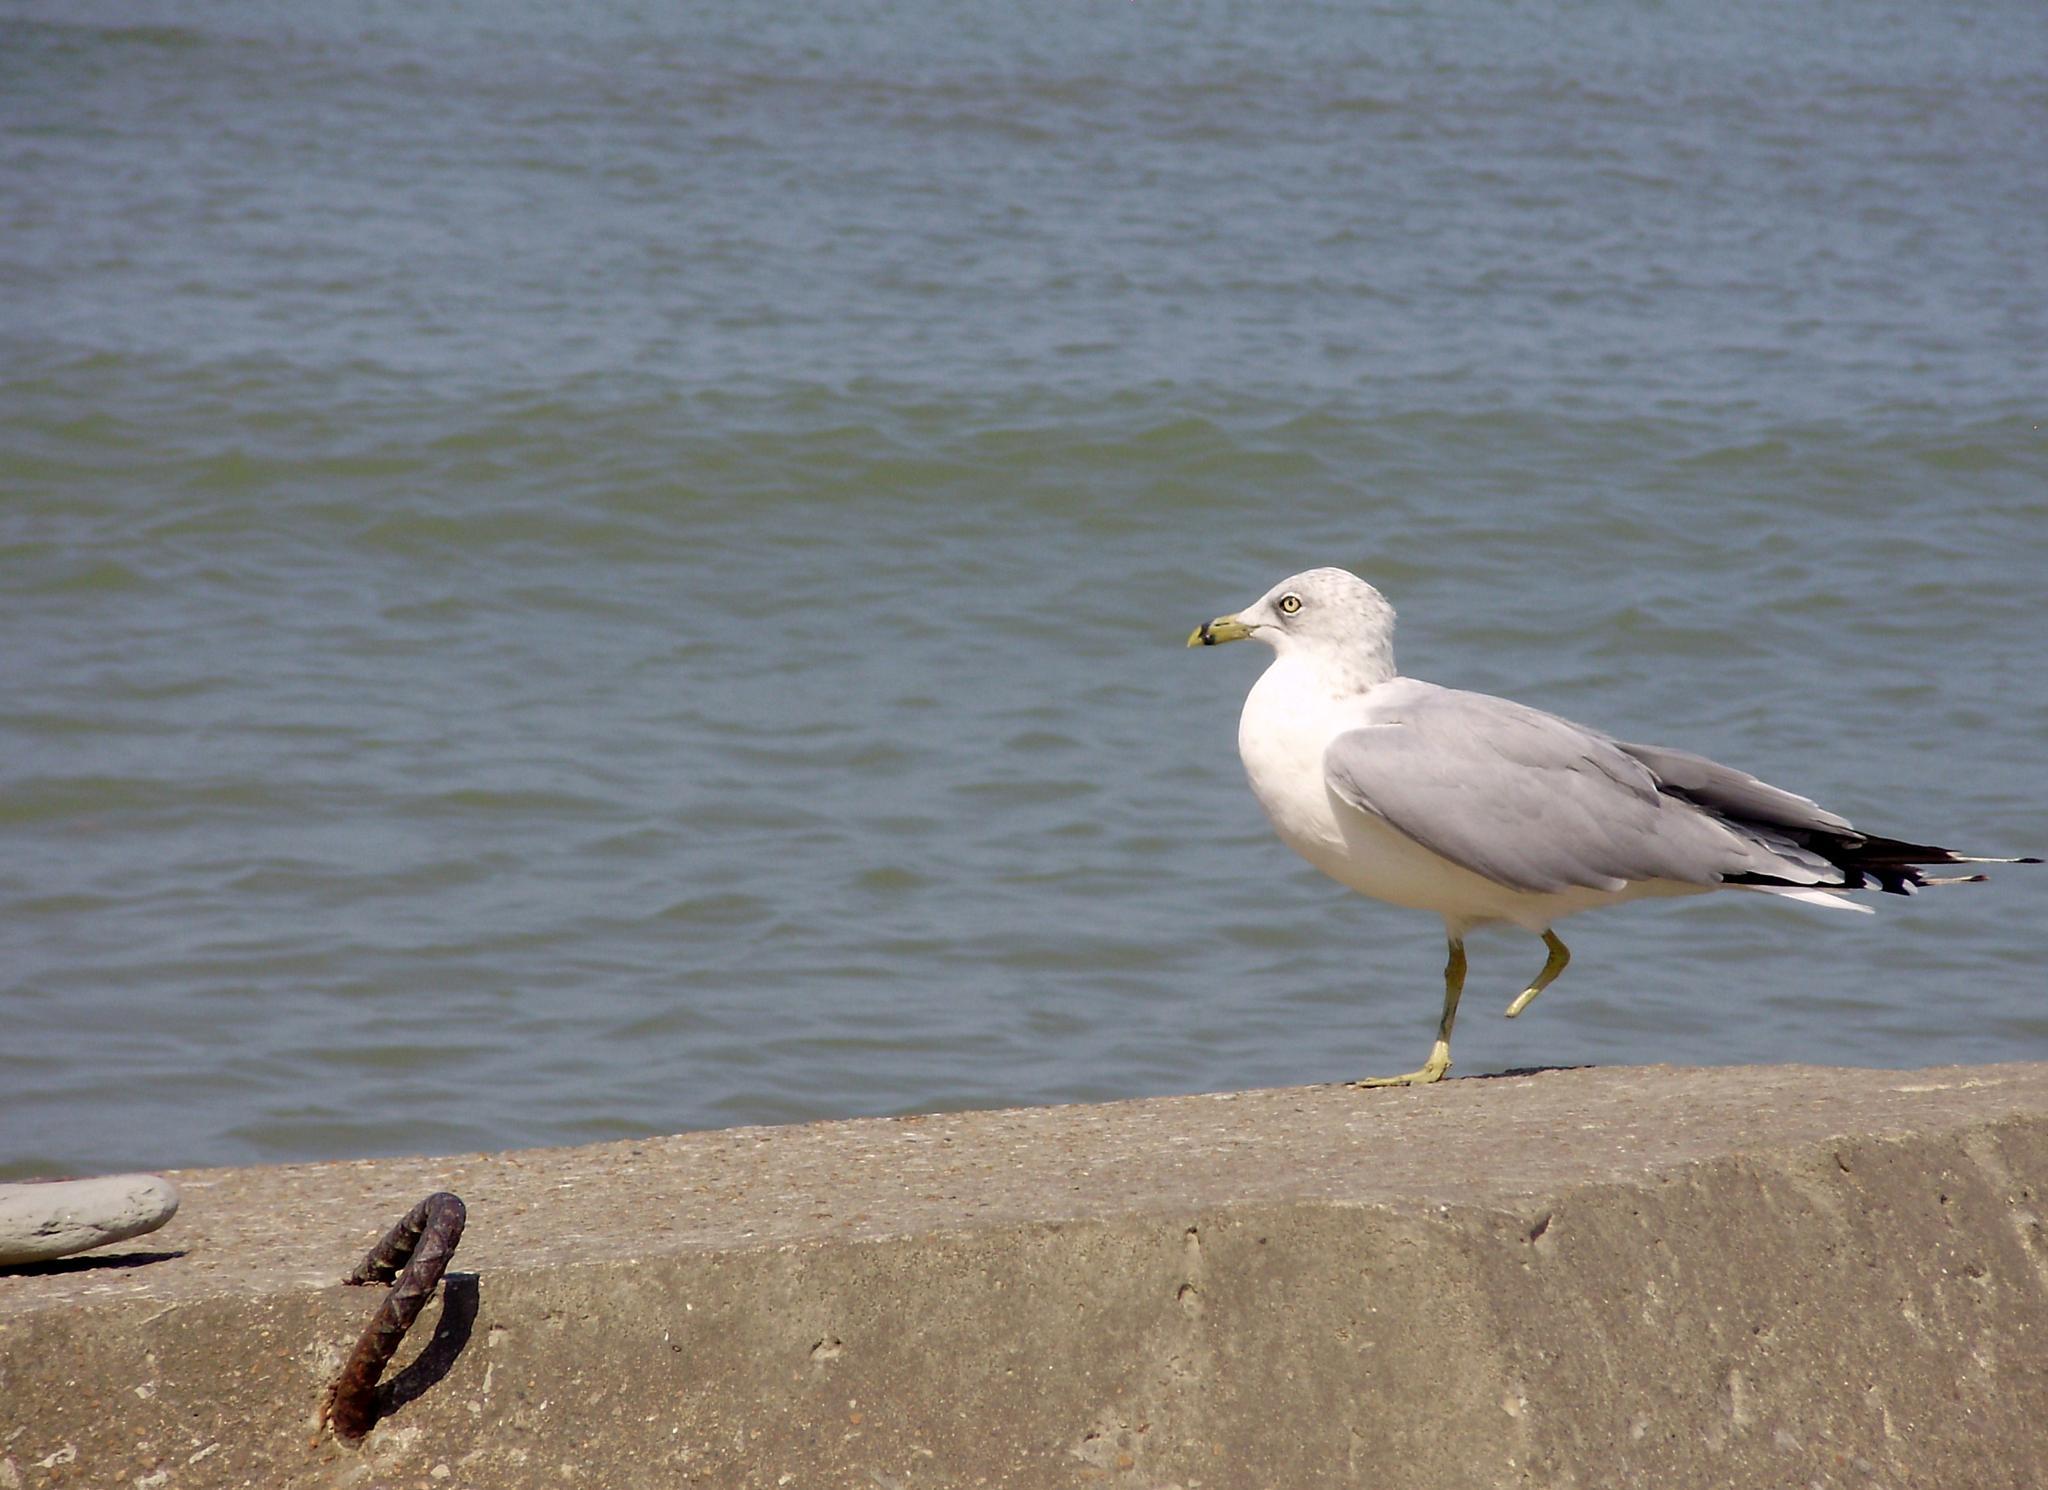 The Lone Seagull by mkunik